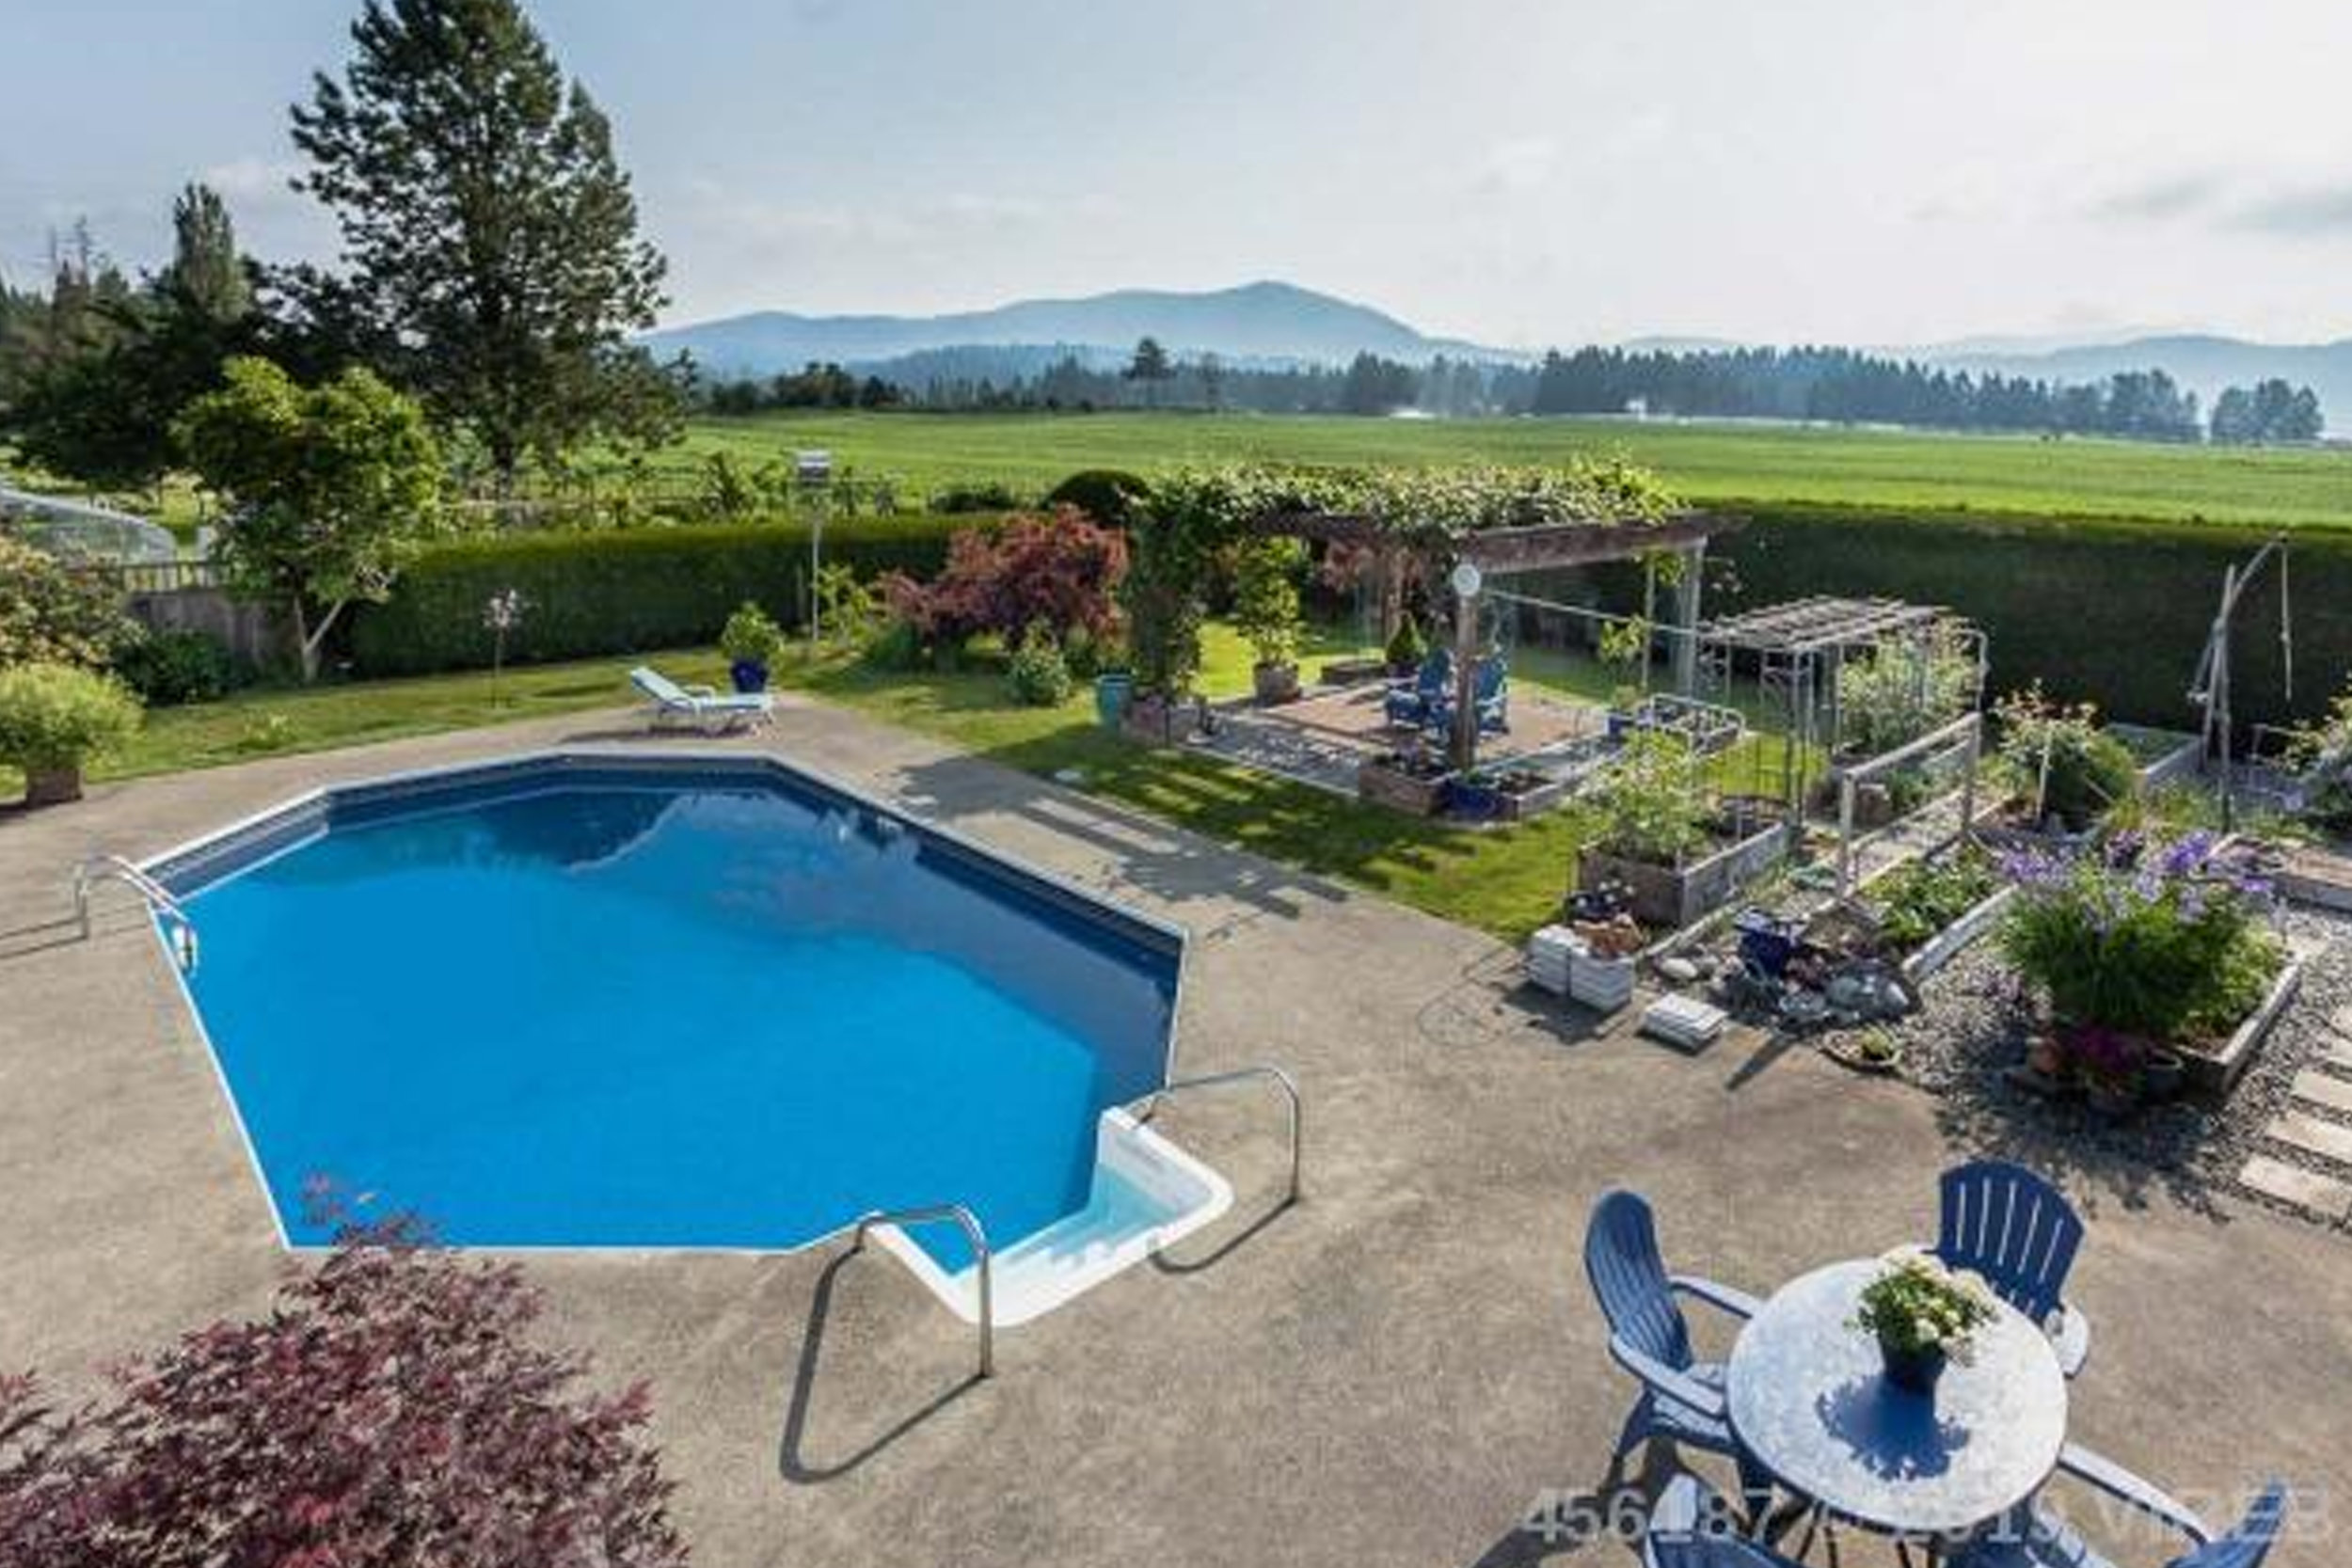 6595 Lakes Rd    MLS  456187   LISTING PRICE  $549,000   BED  5  Bath  3   CARPORT  2 Parking   SQFT  3173 Sqft   BUILT  1976   PROPERTY TAX  $3135.00